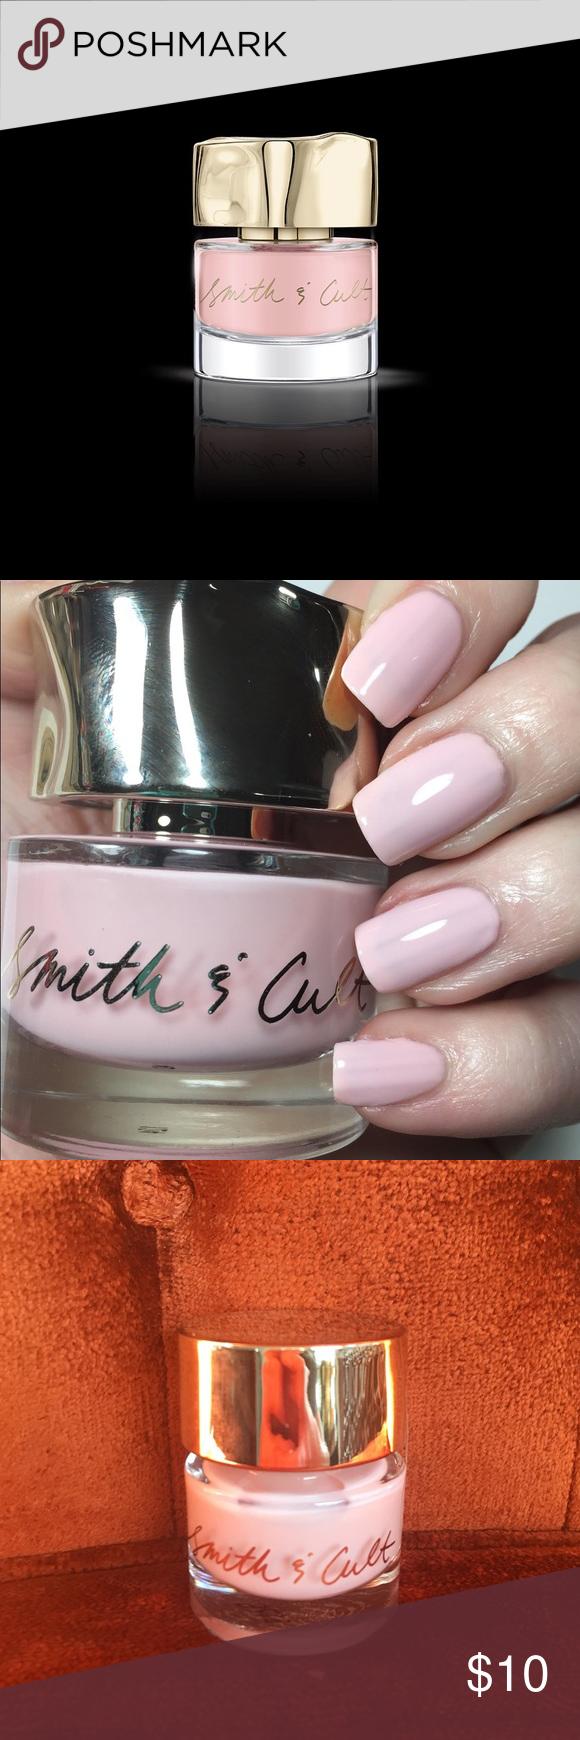 Smith and Cult Pillow Pie Nail Polish Brand New NWT | Nail polish ...